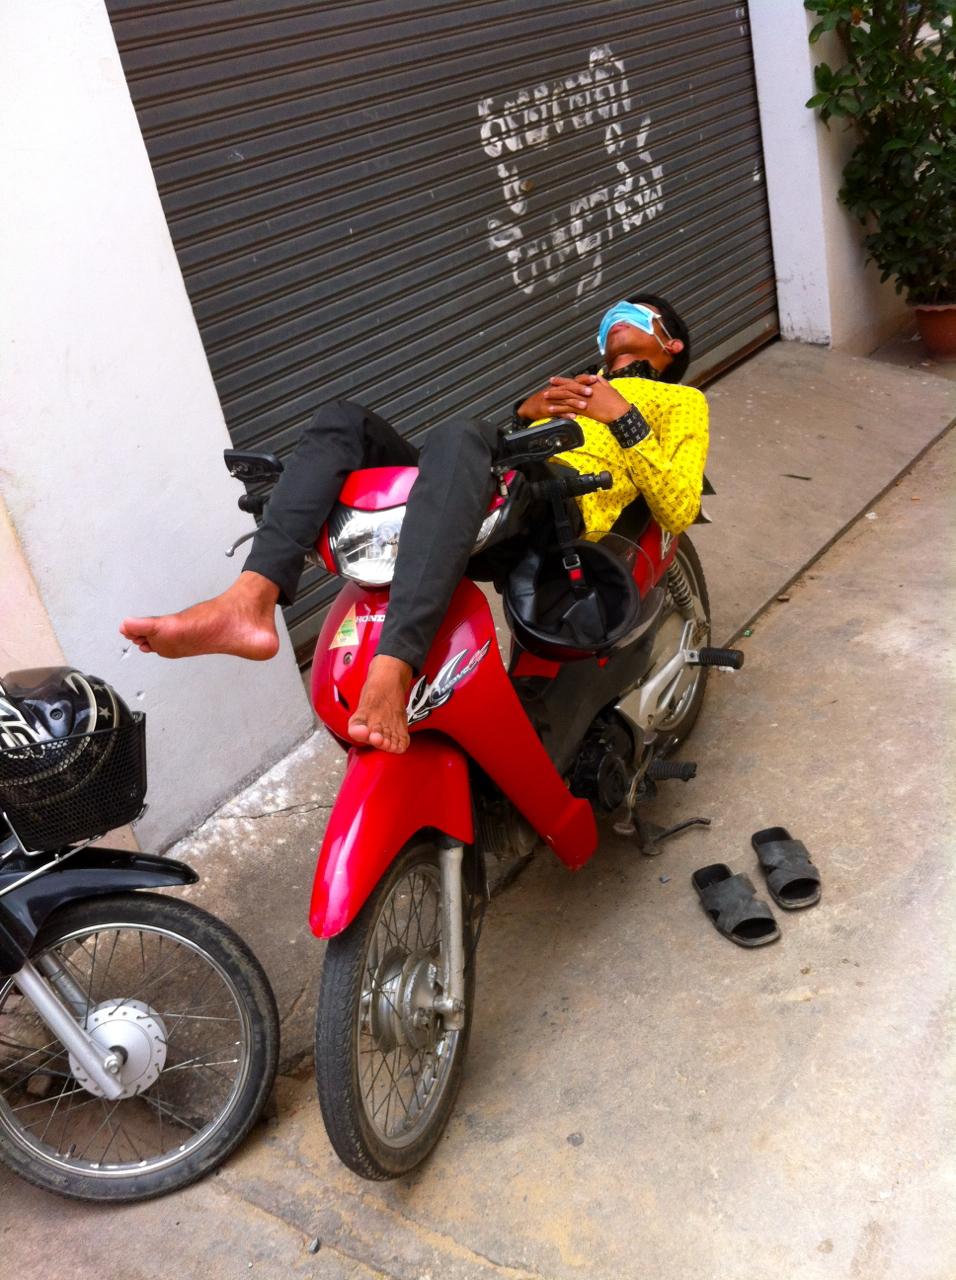 Another precariously sleeping Moto Dop